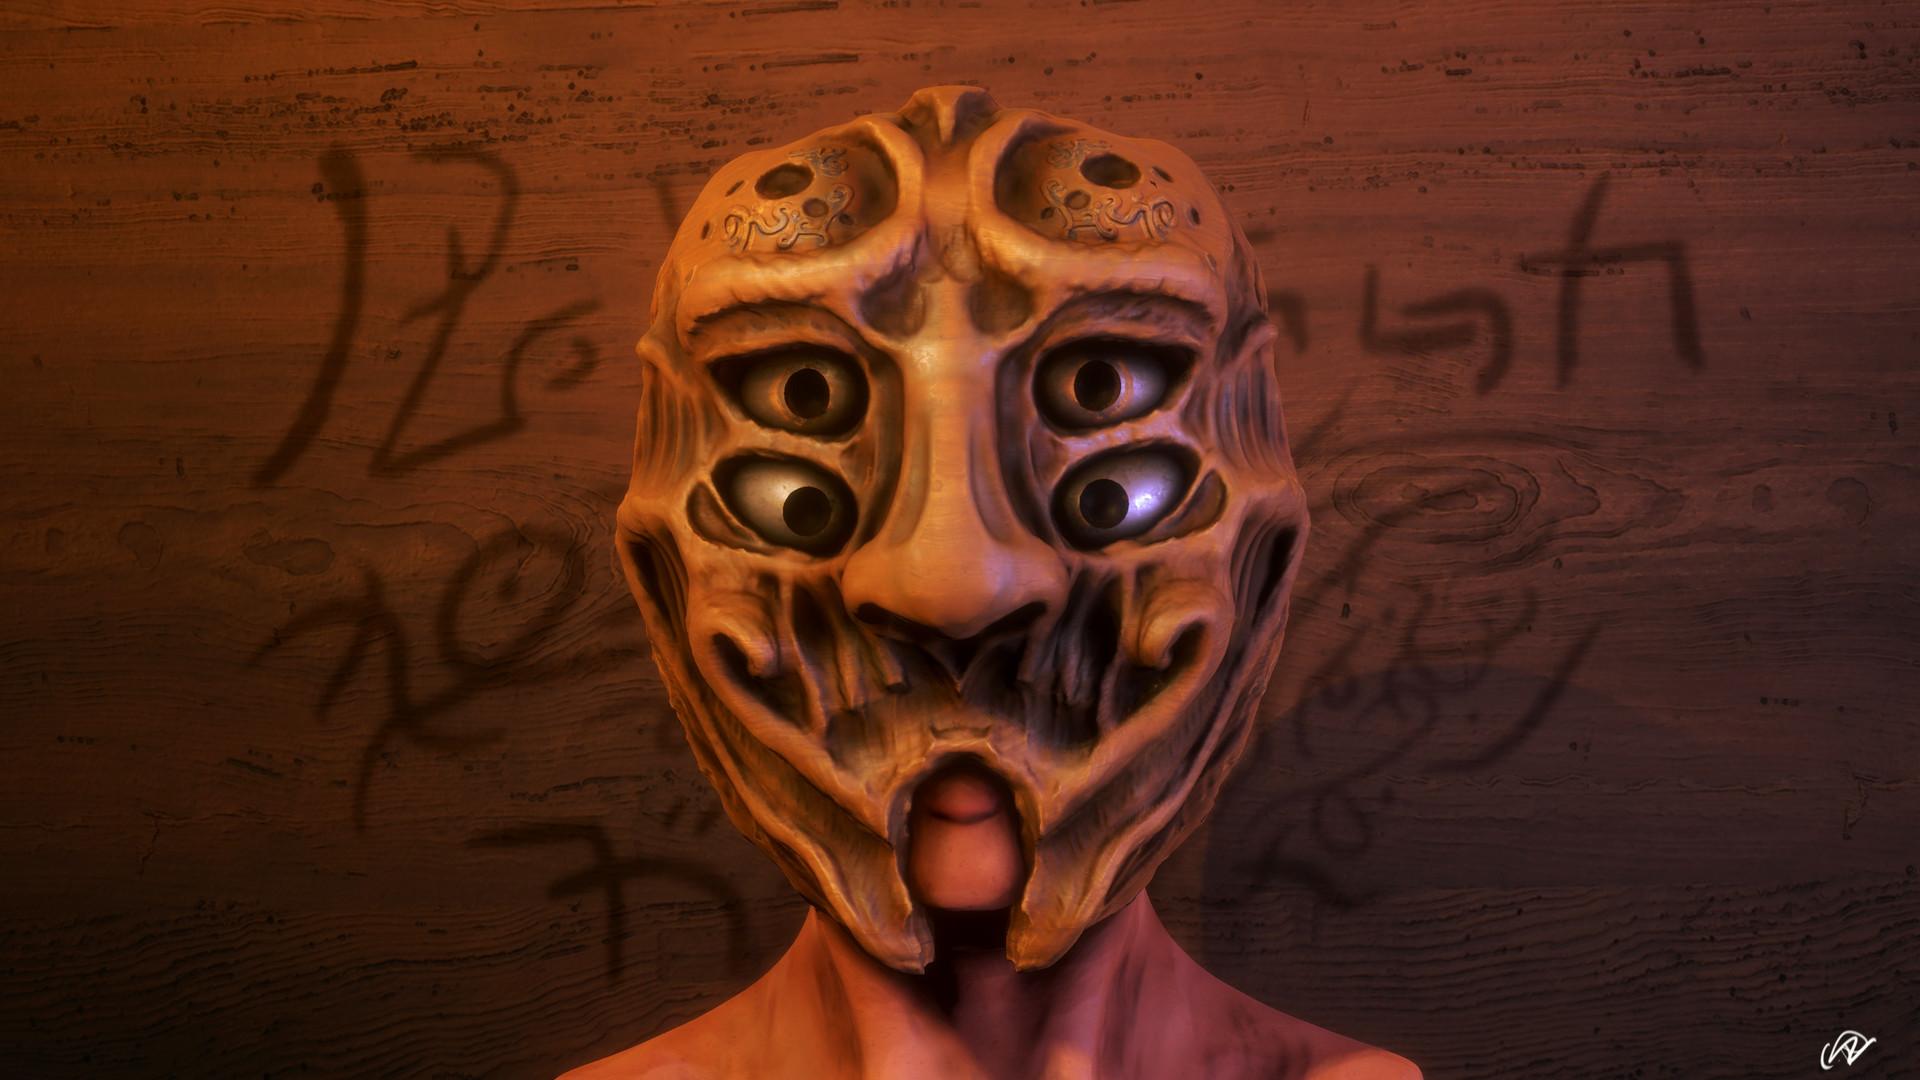 #SculptJanuary Day 10 - Man (Portrait)